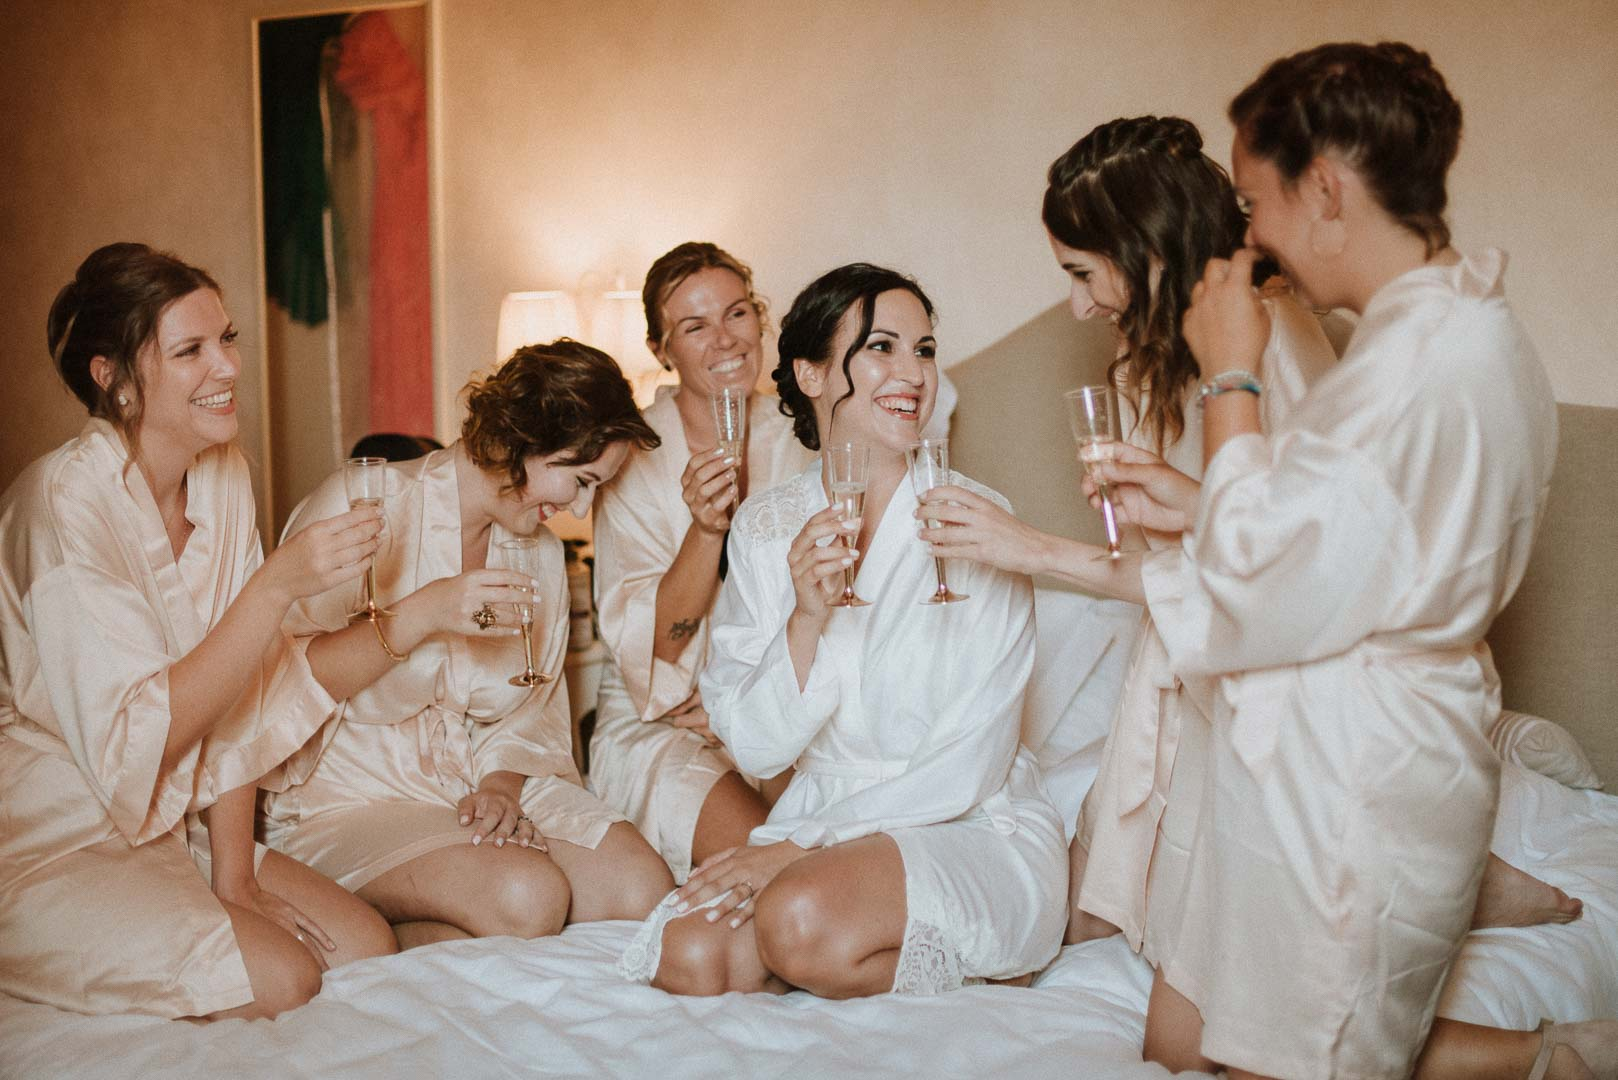 wedding-photographer-destination-fineart-bespoke-reportage-tuscany-villascorzi-vivianeizzo-spazio46-43